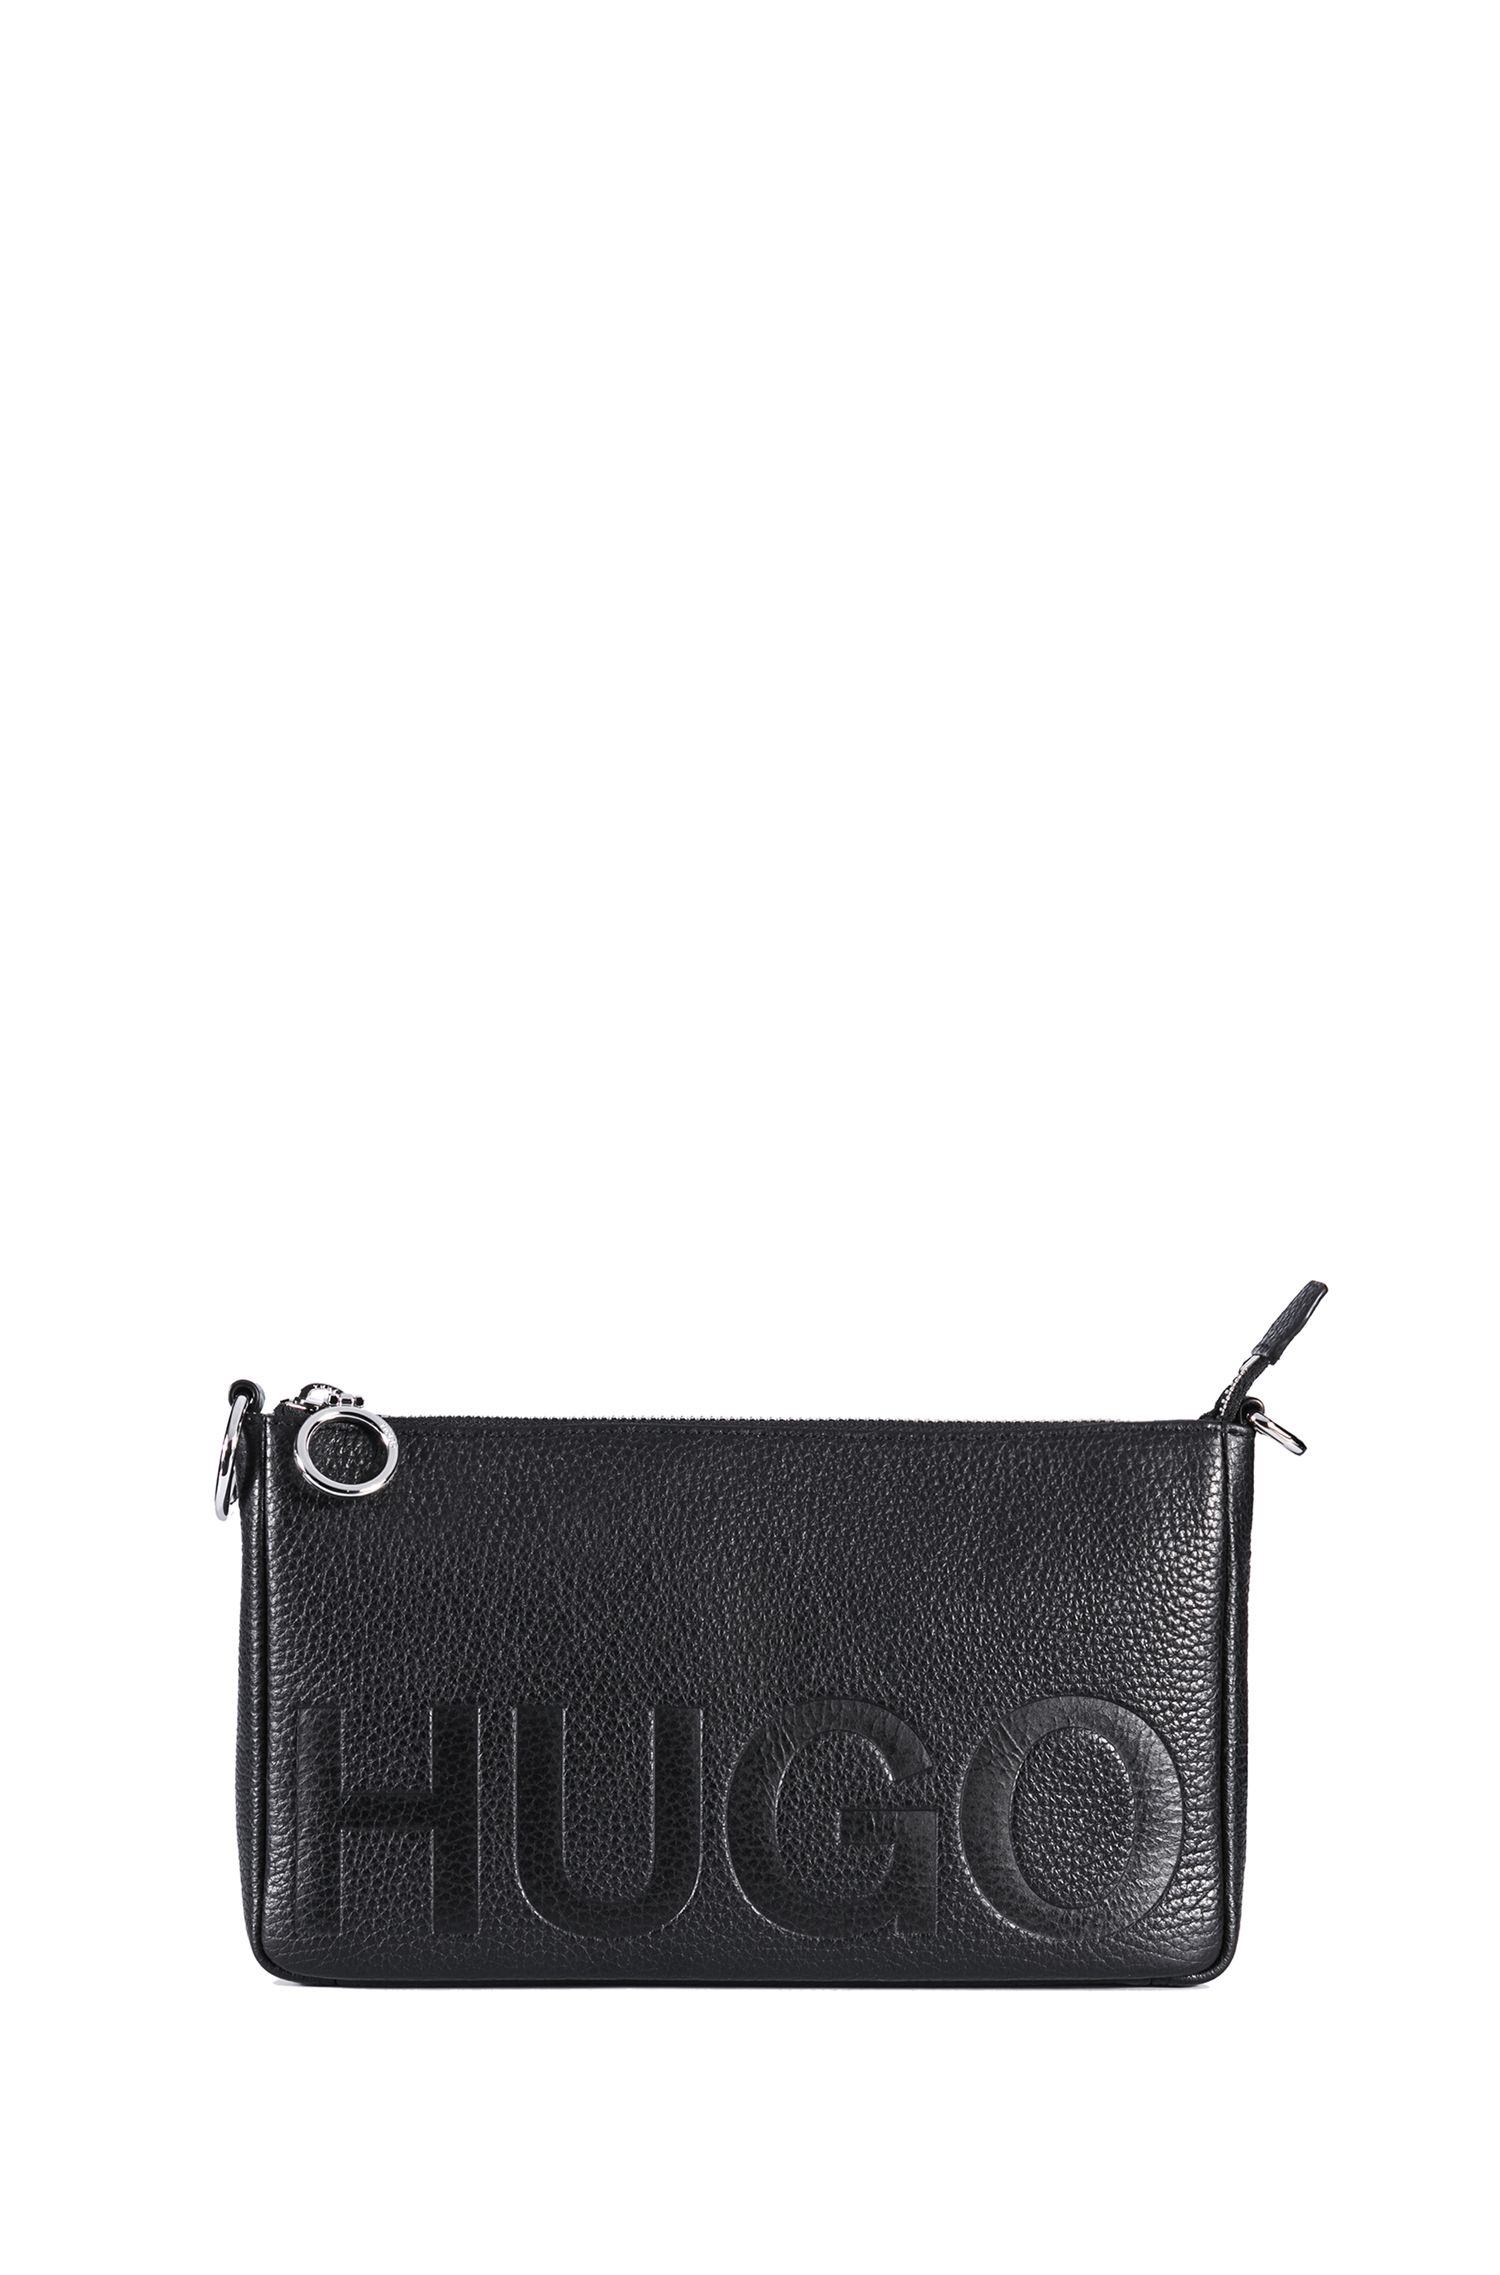 Debossed Leather Bag   Mayfair Mini Bag